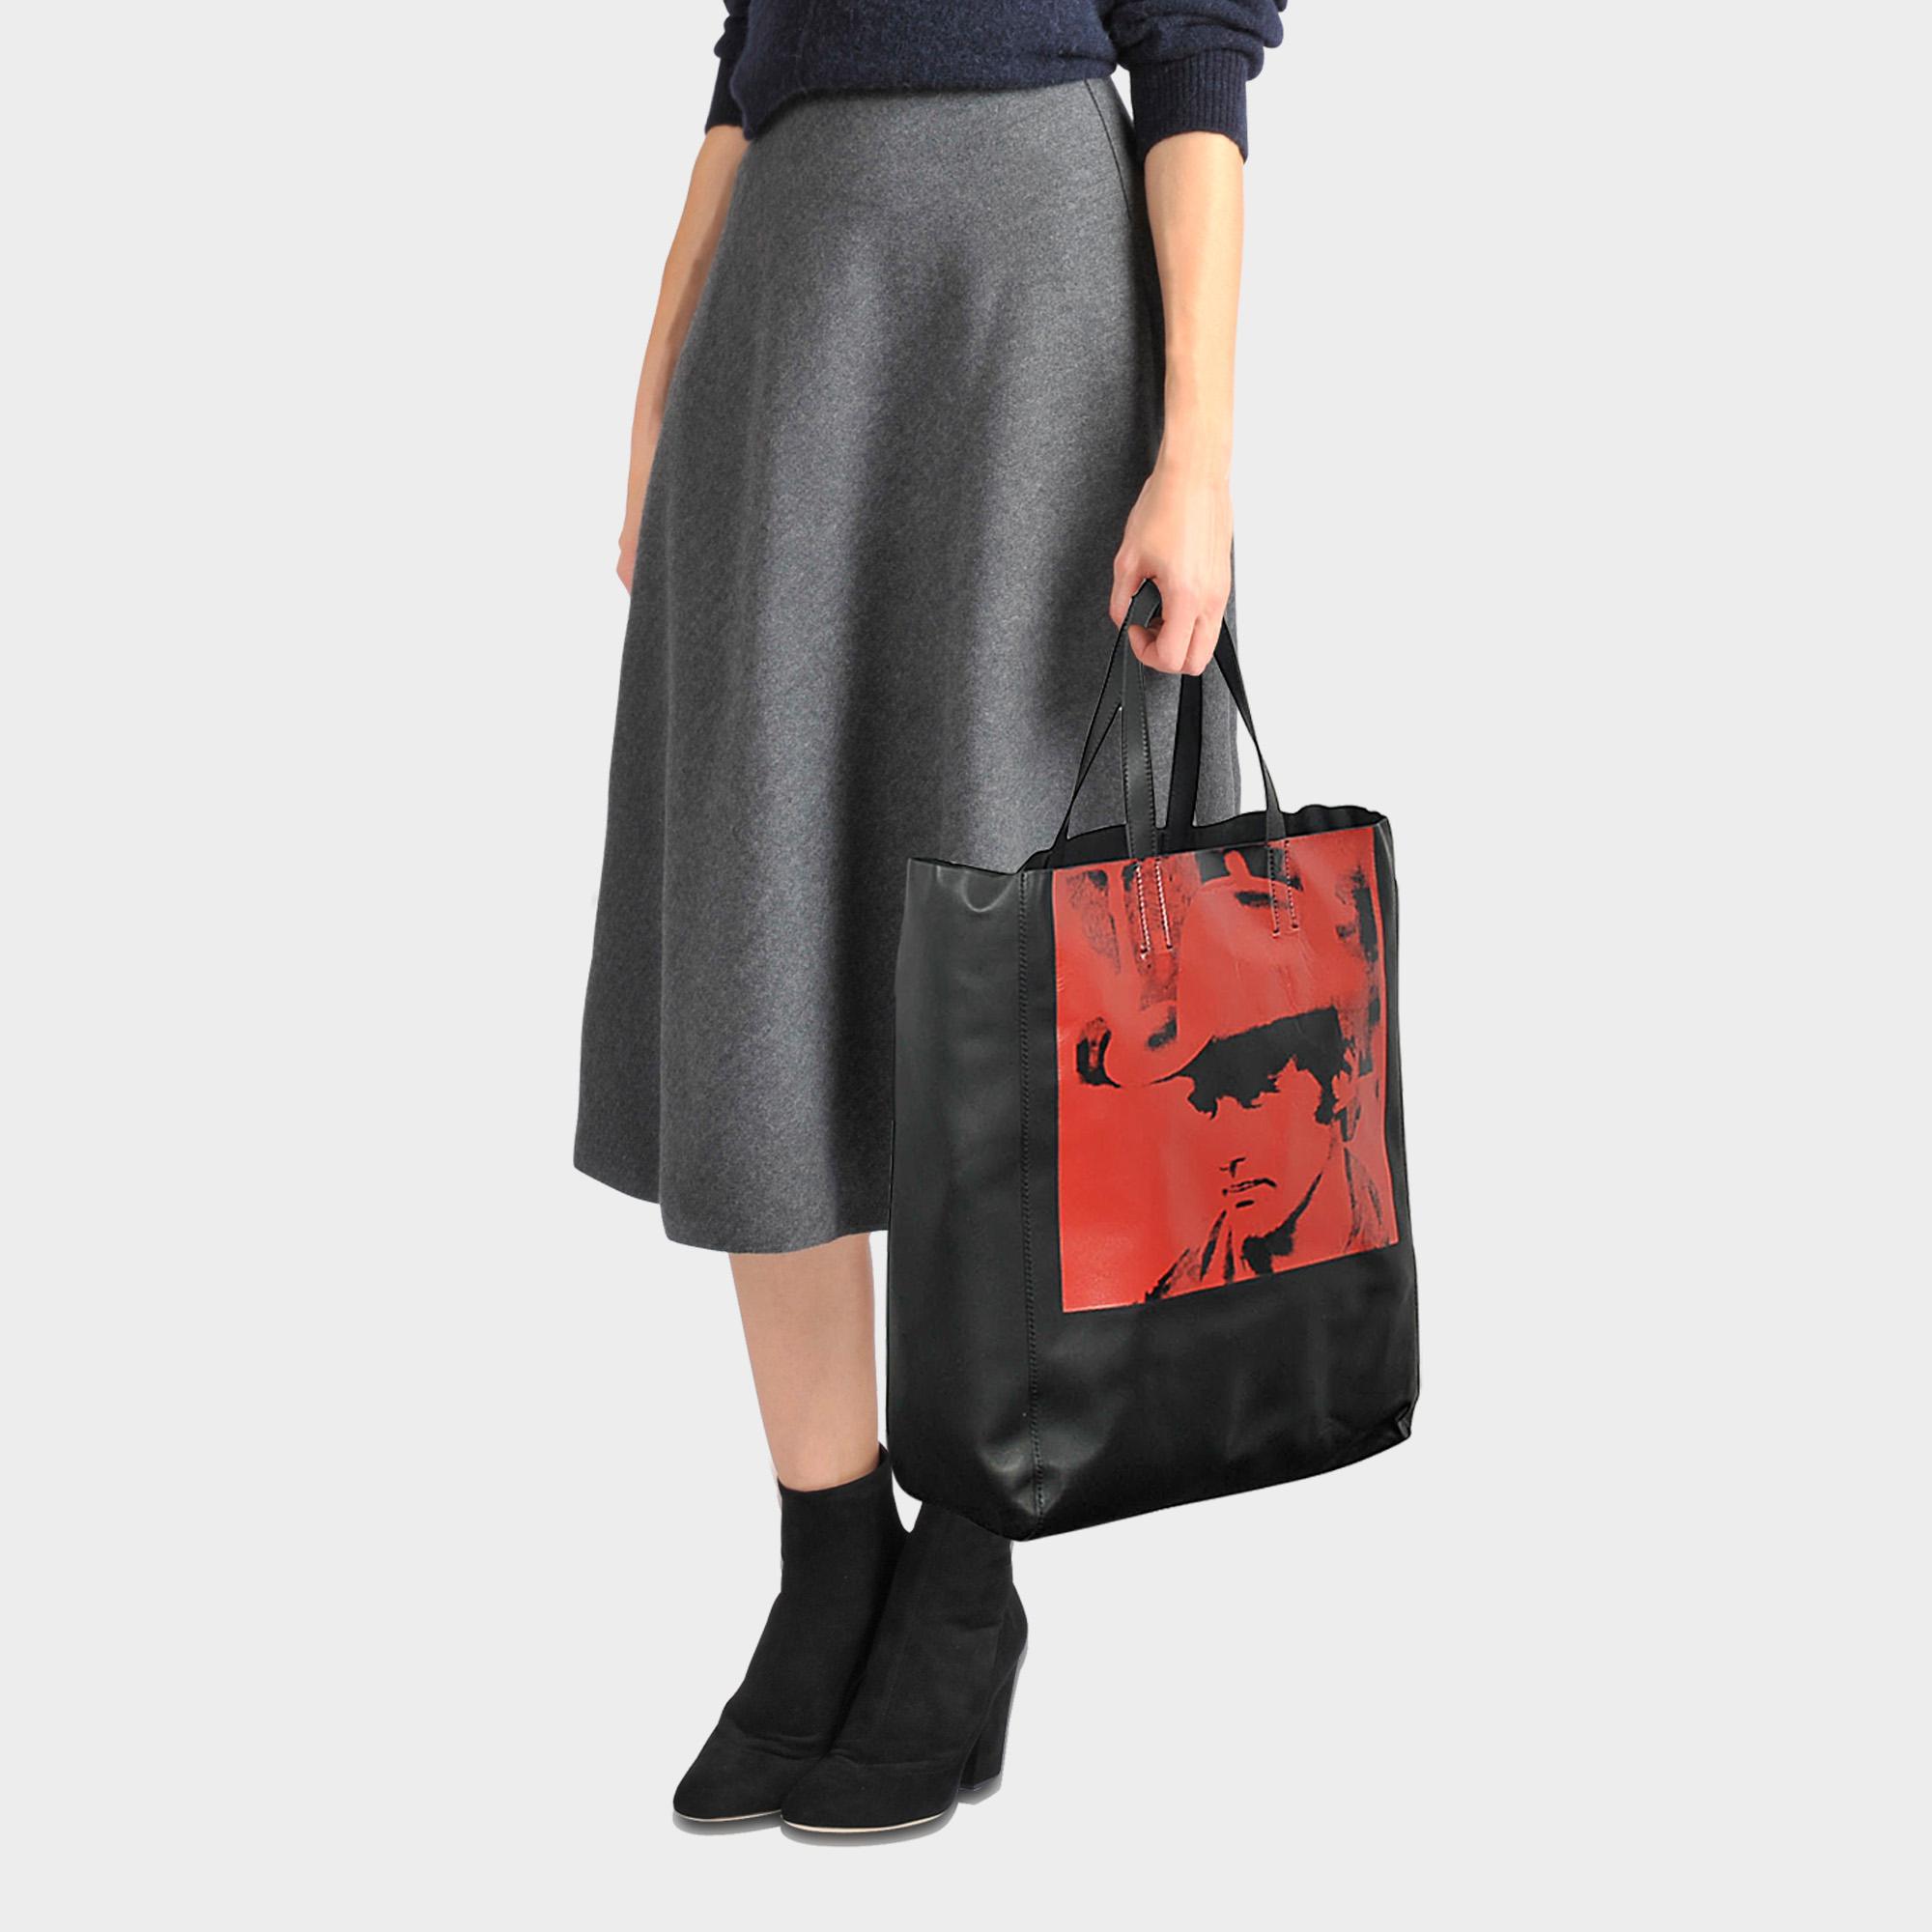 In Bag Hopper Soft Andy Klein Warhol Calvin Dennis Tote 205w39nyc By T3uKJ1lFc